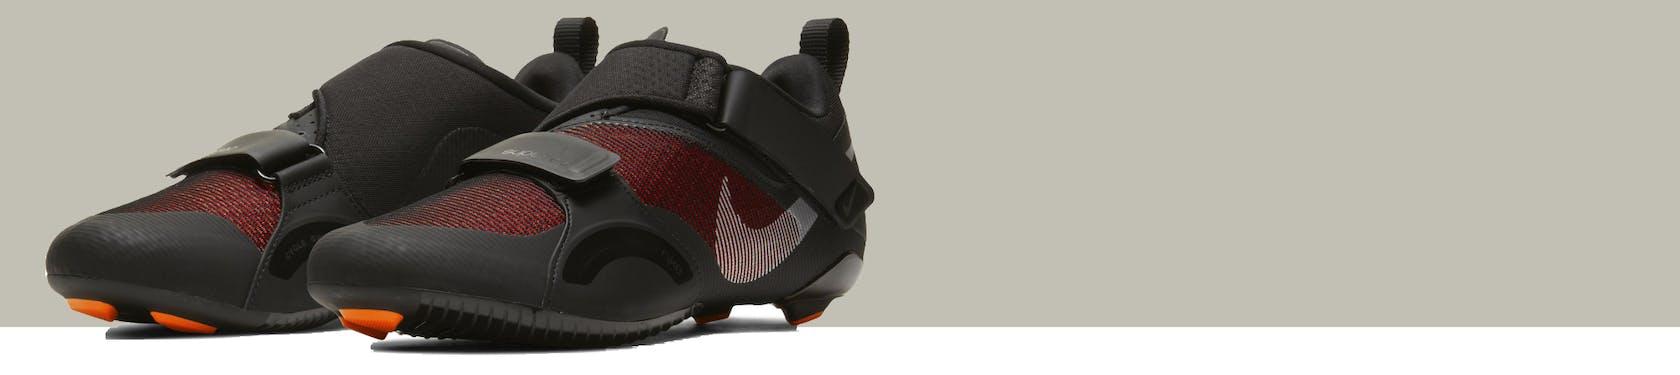 Bikeschuhe Nike im Onlineshop